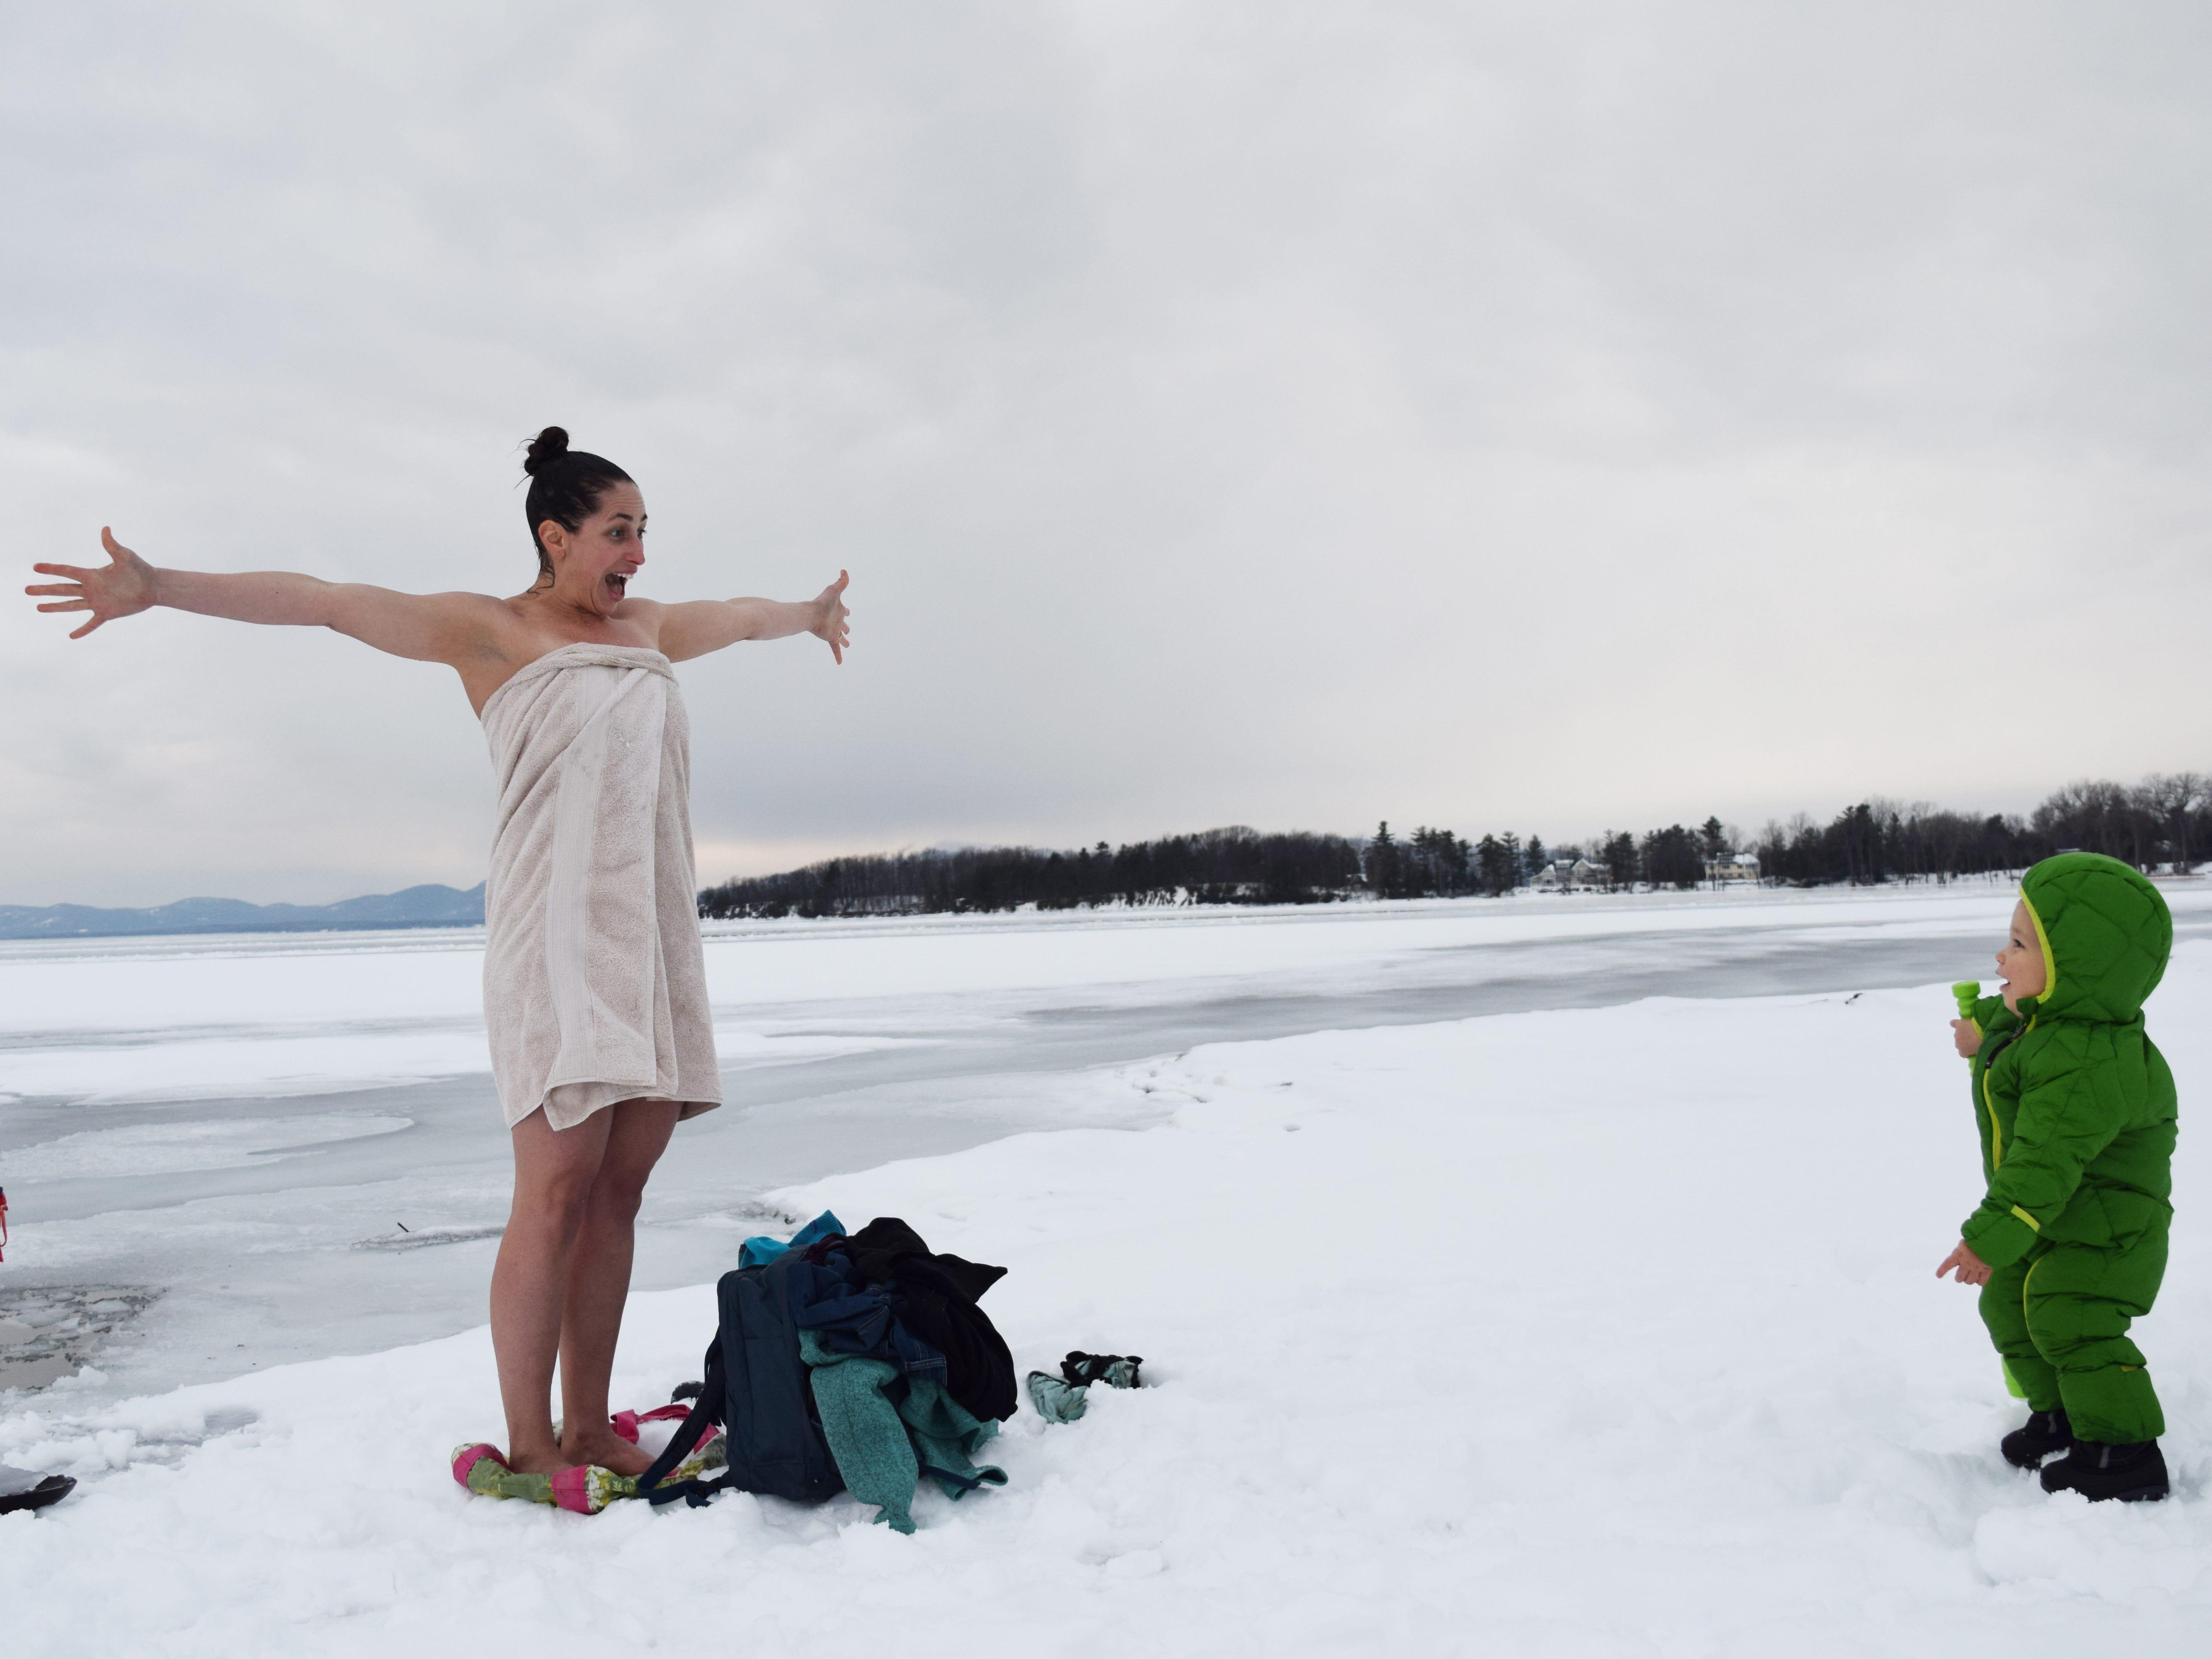 Elise Schadler of Burlington greets her son, Finn, after taking a quick dip in Lake Champlain on Feb. 15, 2019.